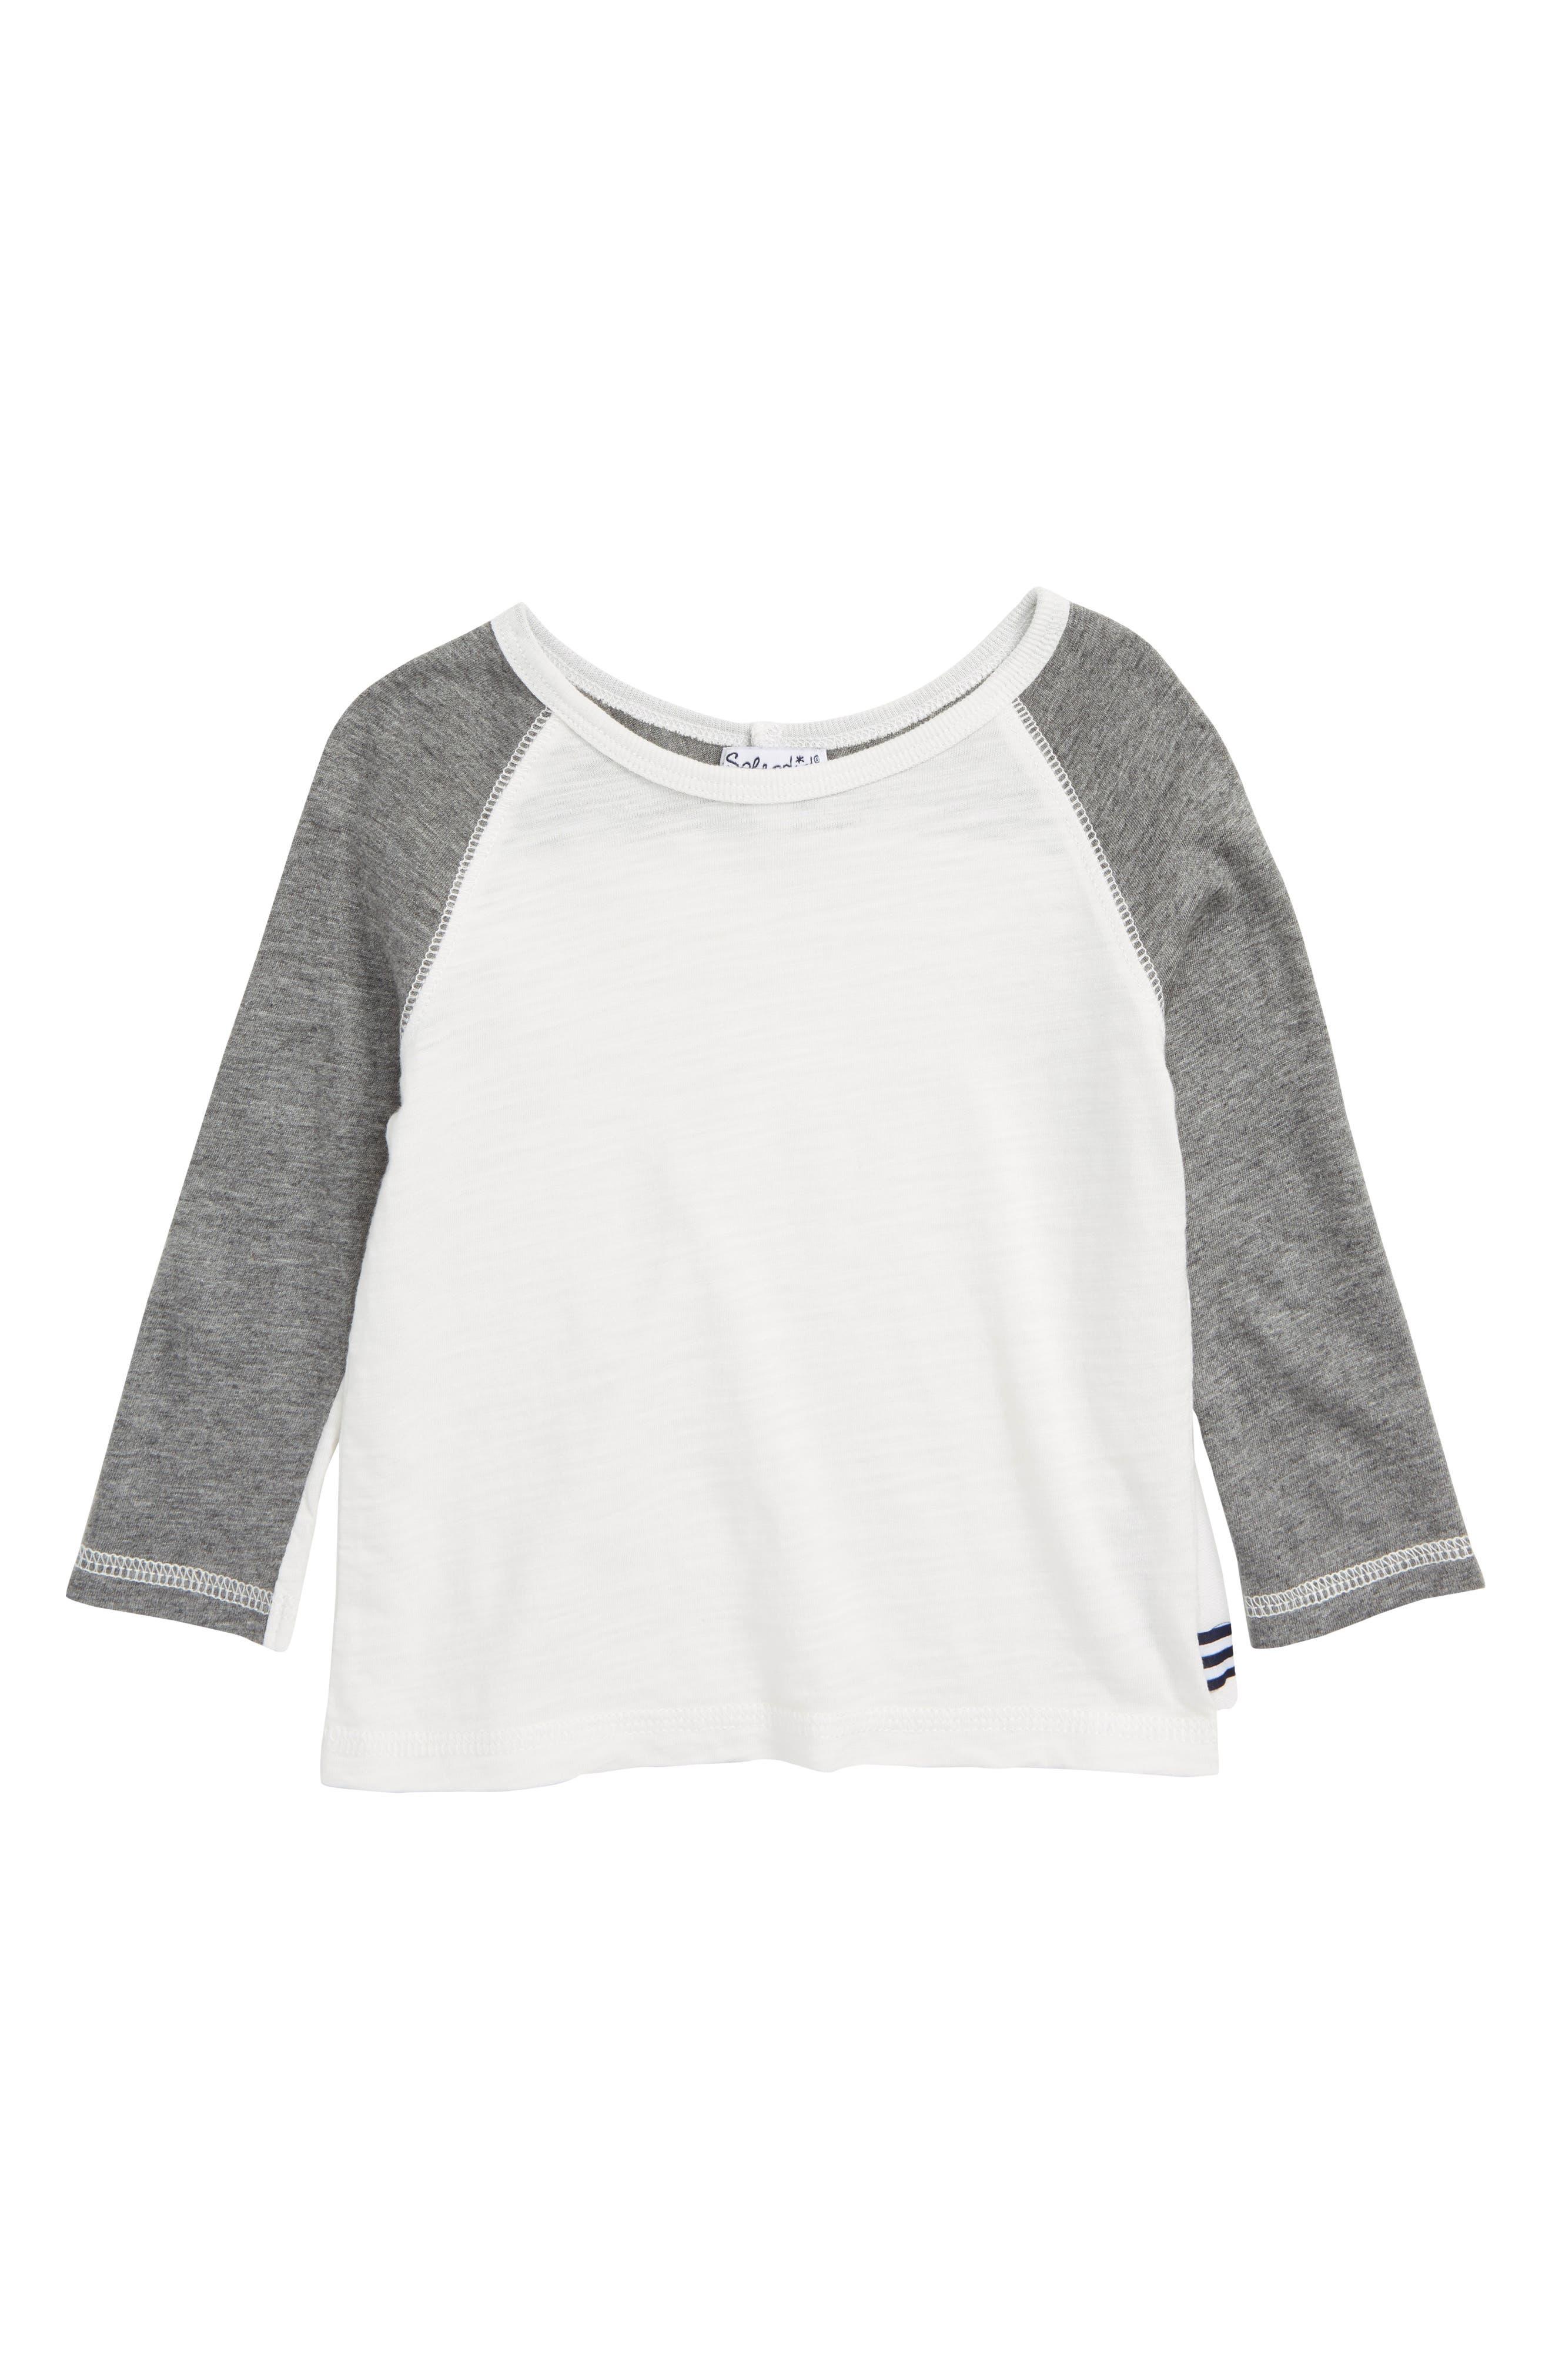 Always Raglan T-Shirt,                         Main,                         color, OFF WHITE/ GREY